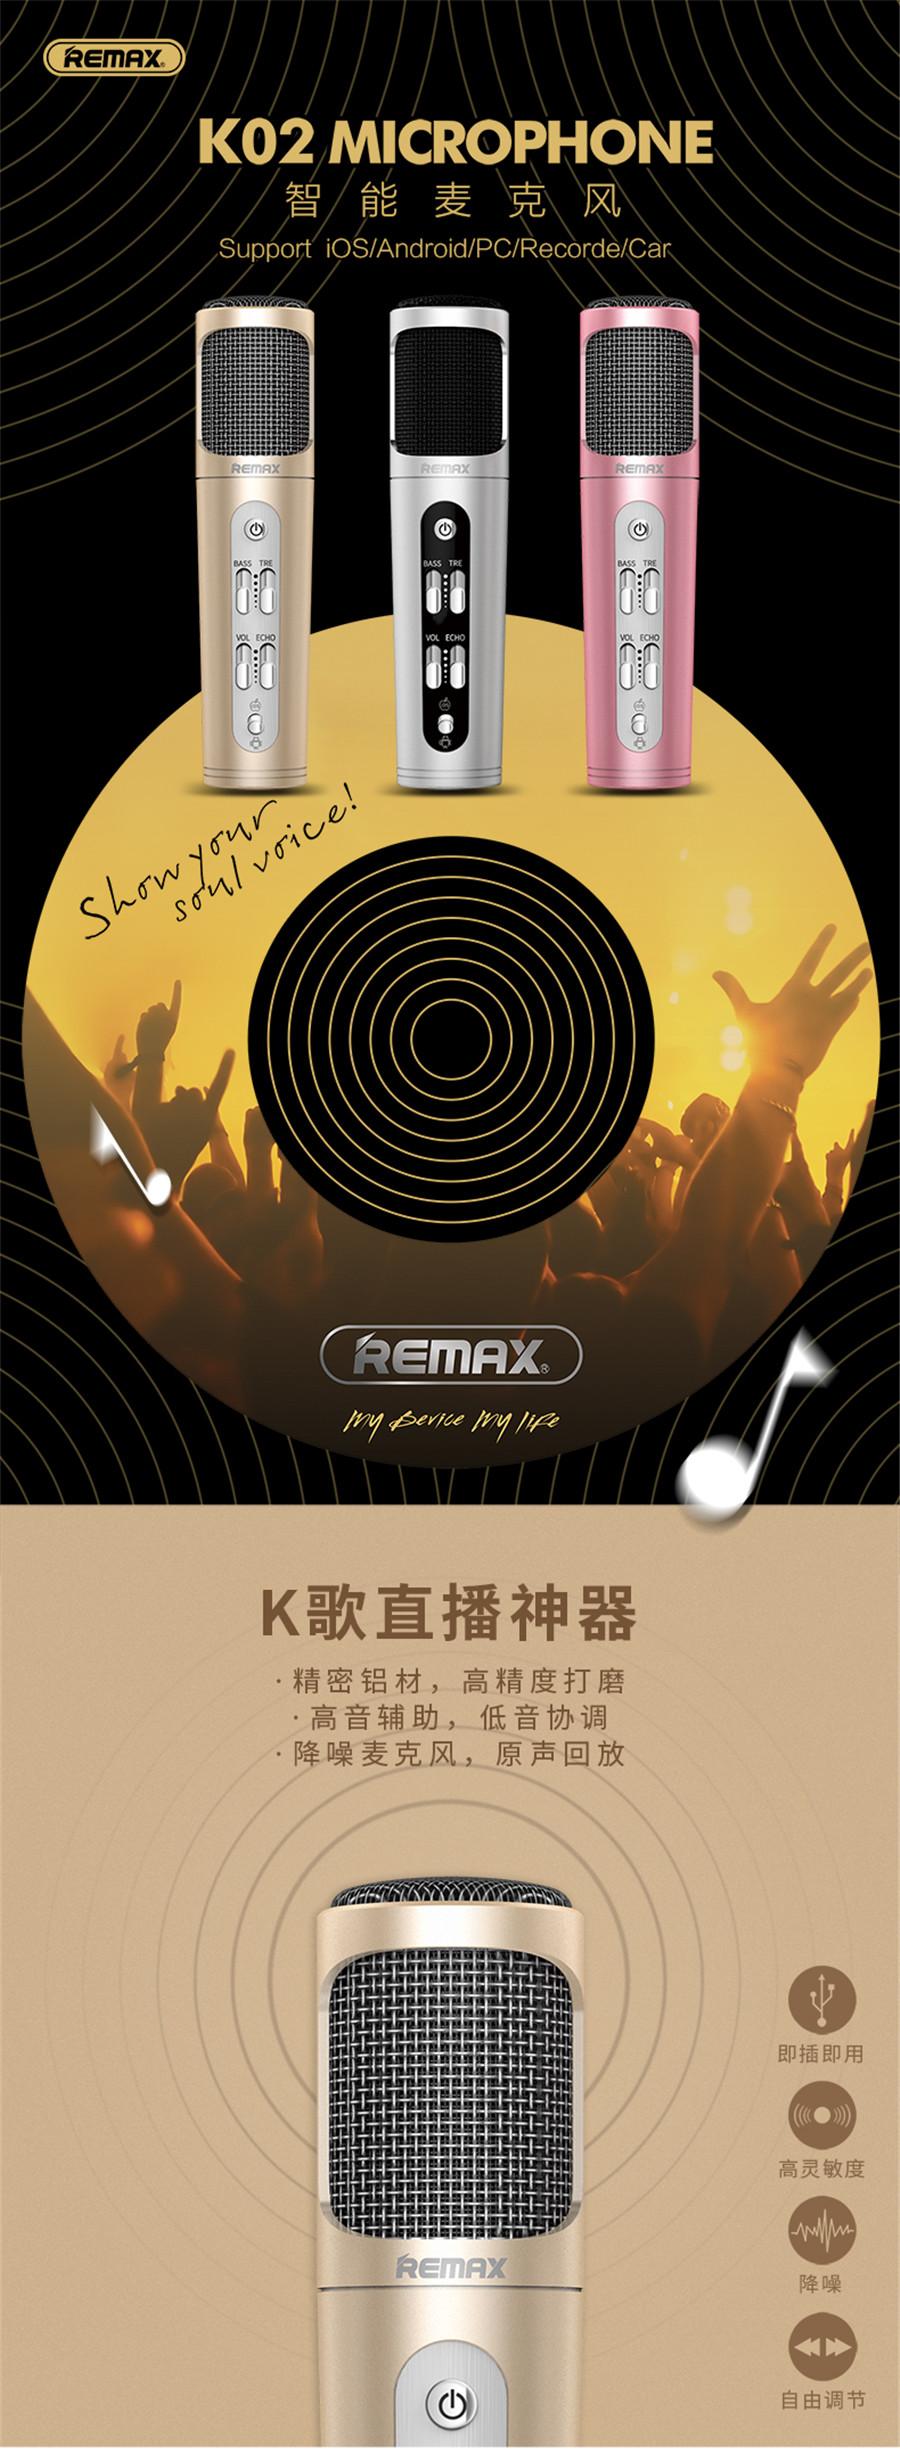 Remax K02 Microphone 1